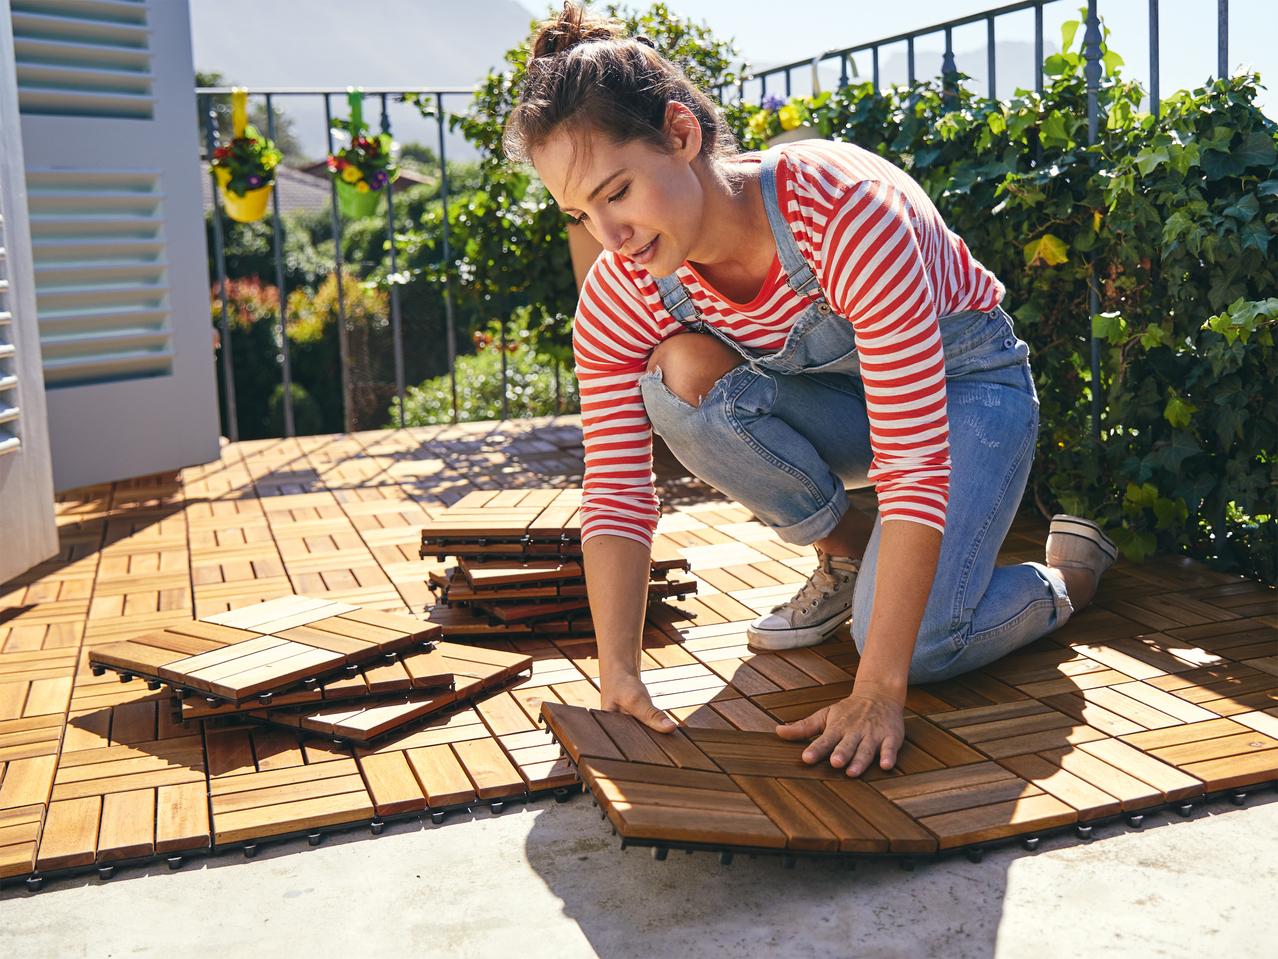 Piastrelle In Legno Florabest : Piastrelle in legno pezzi lidl u svizzera archivio offerte